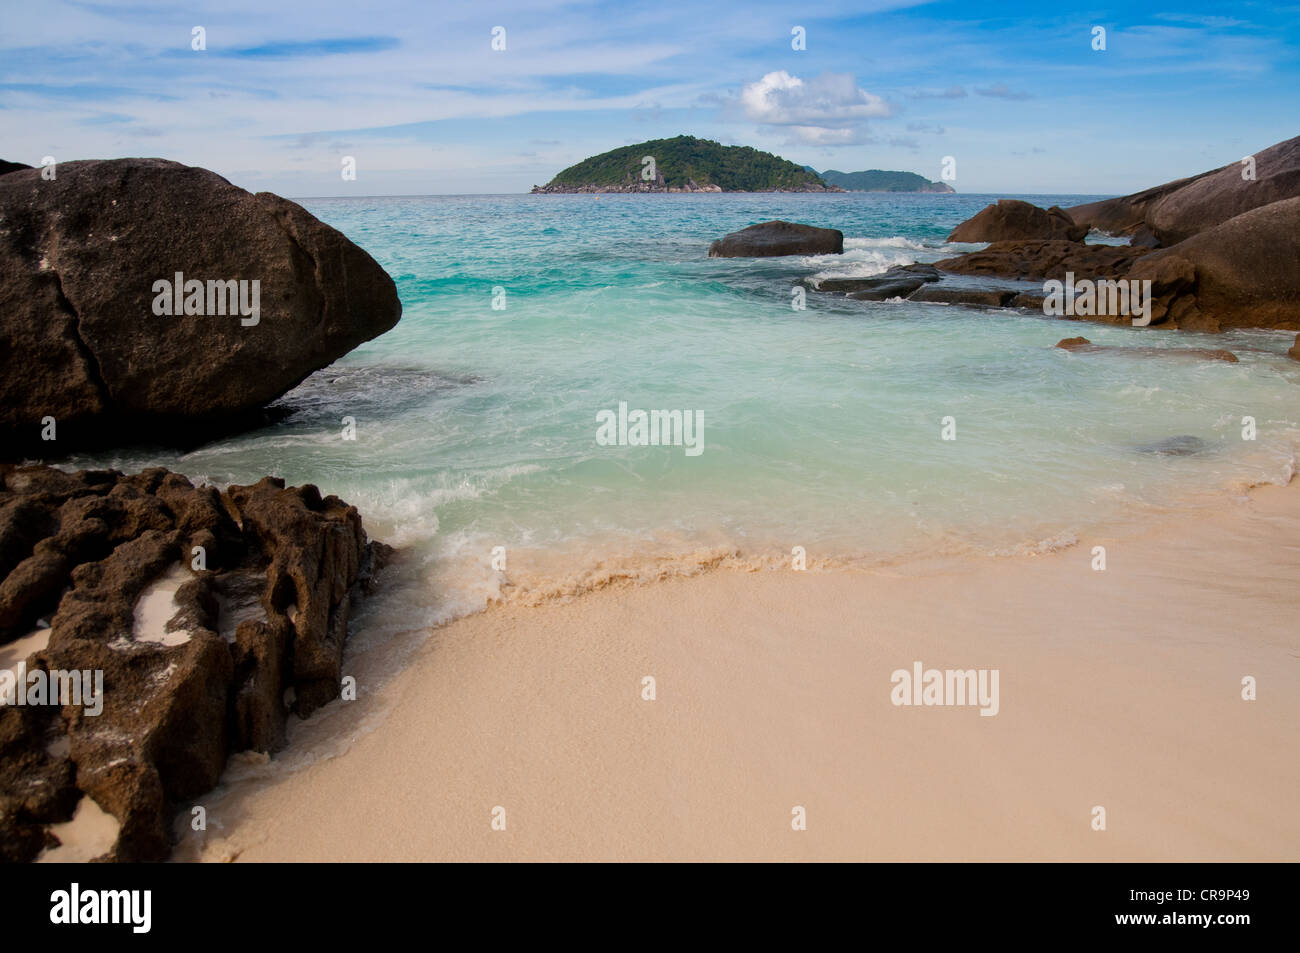 Ko Bangu beach, Similan islands - Stock Image